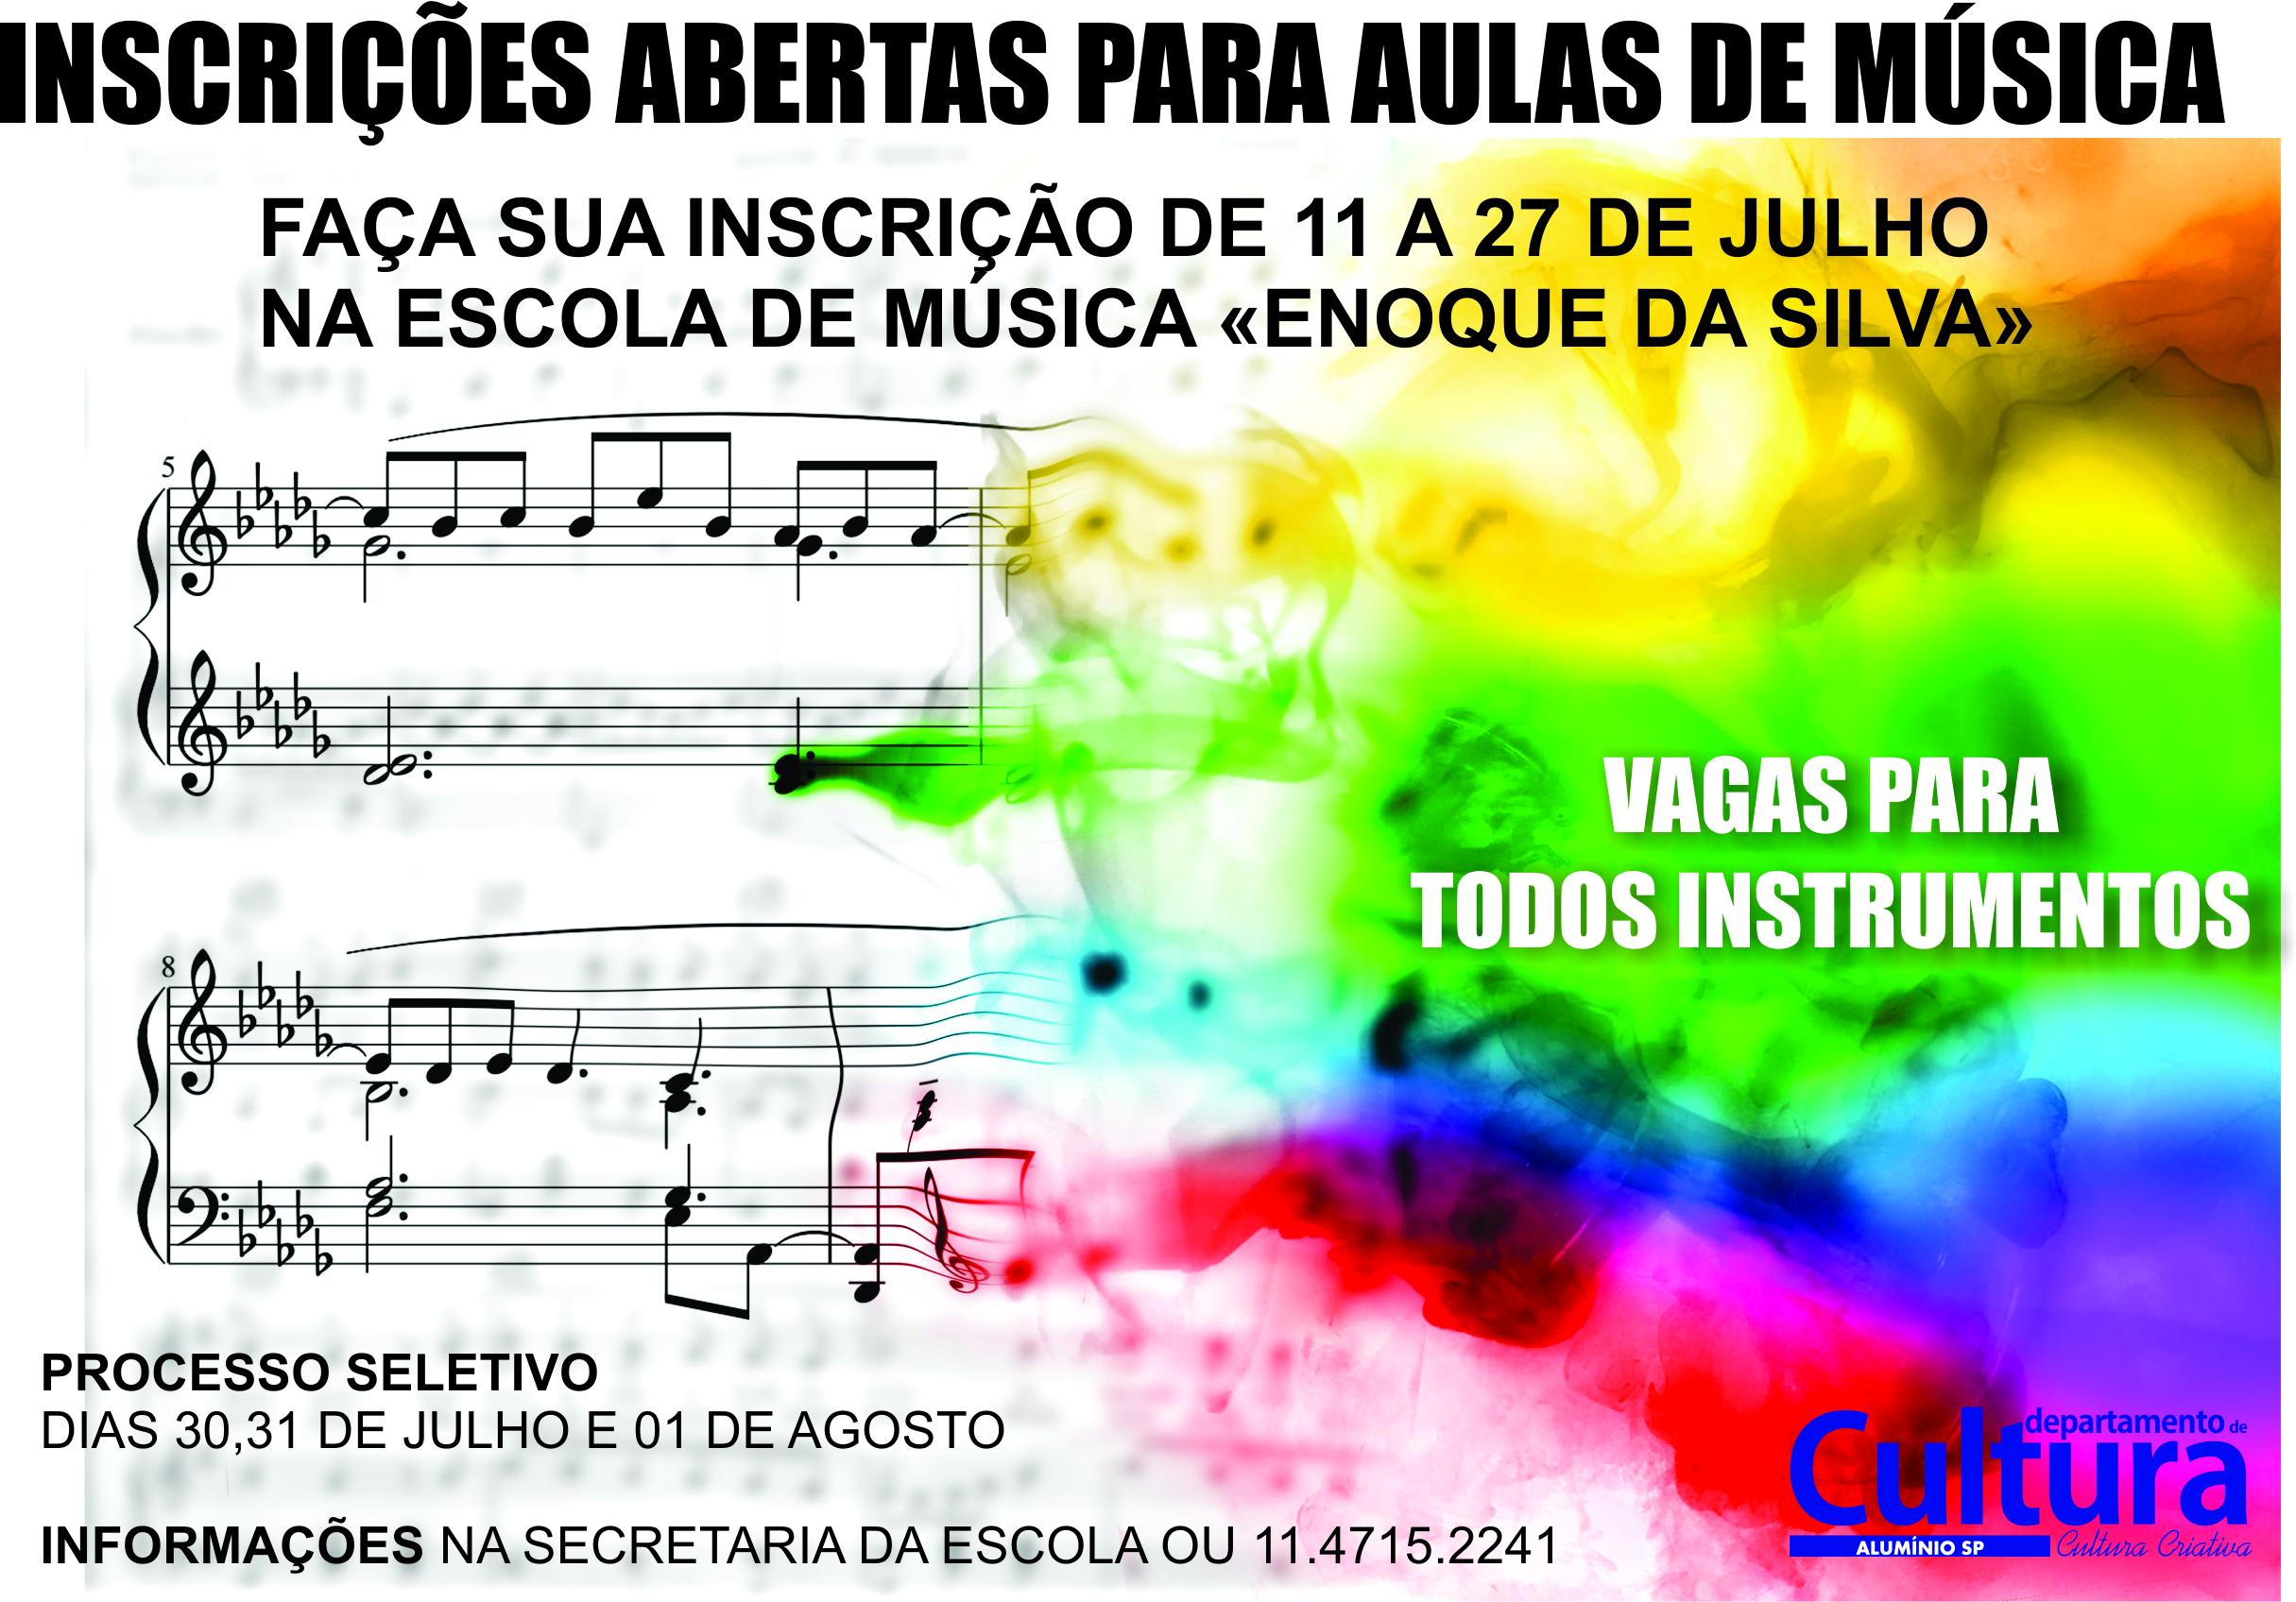 VAGAS AULAS MUSICA SEGUNDO SEMESTRE